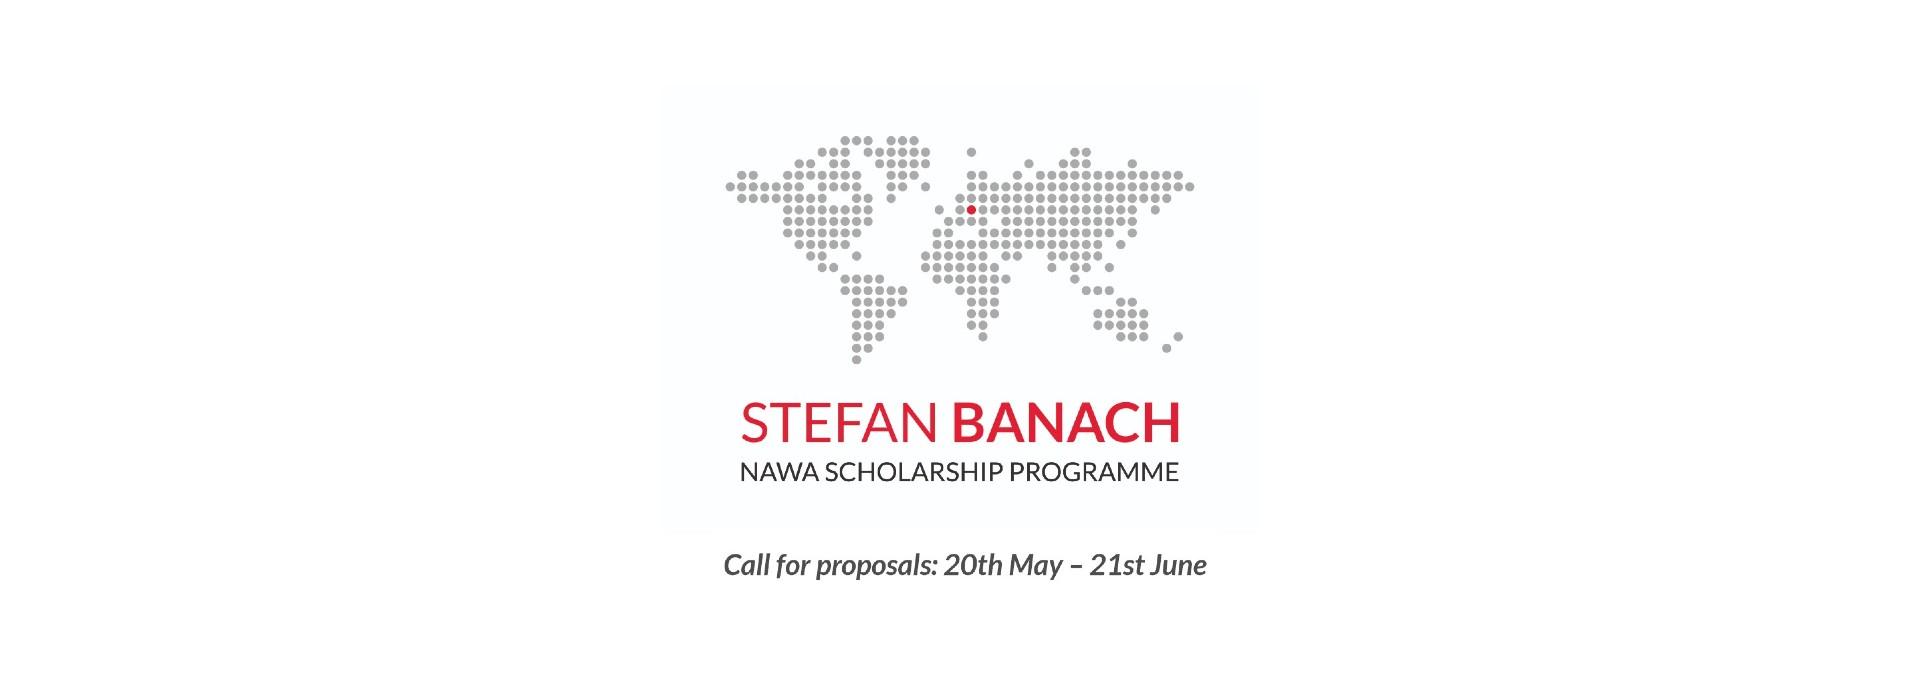 Stefan Banach banner 2021.jpg